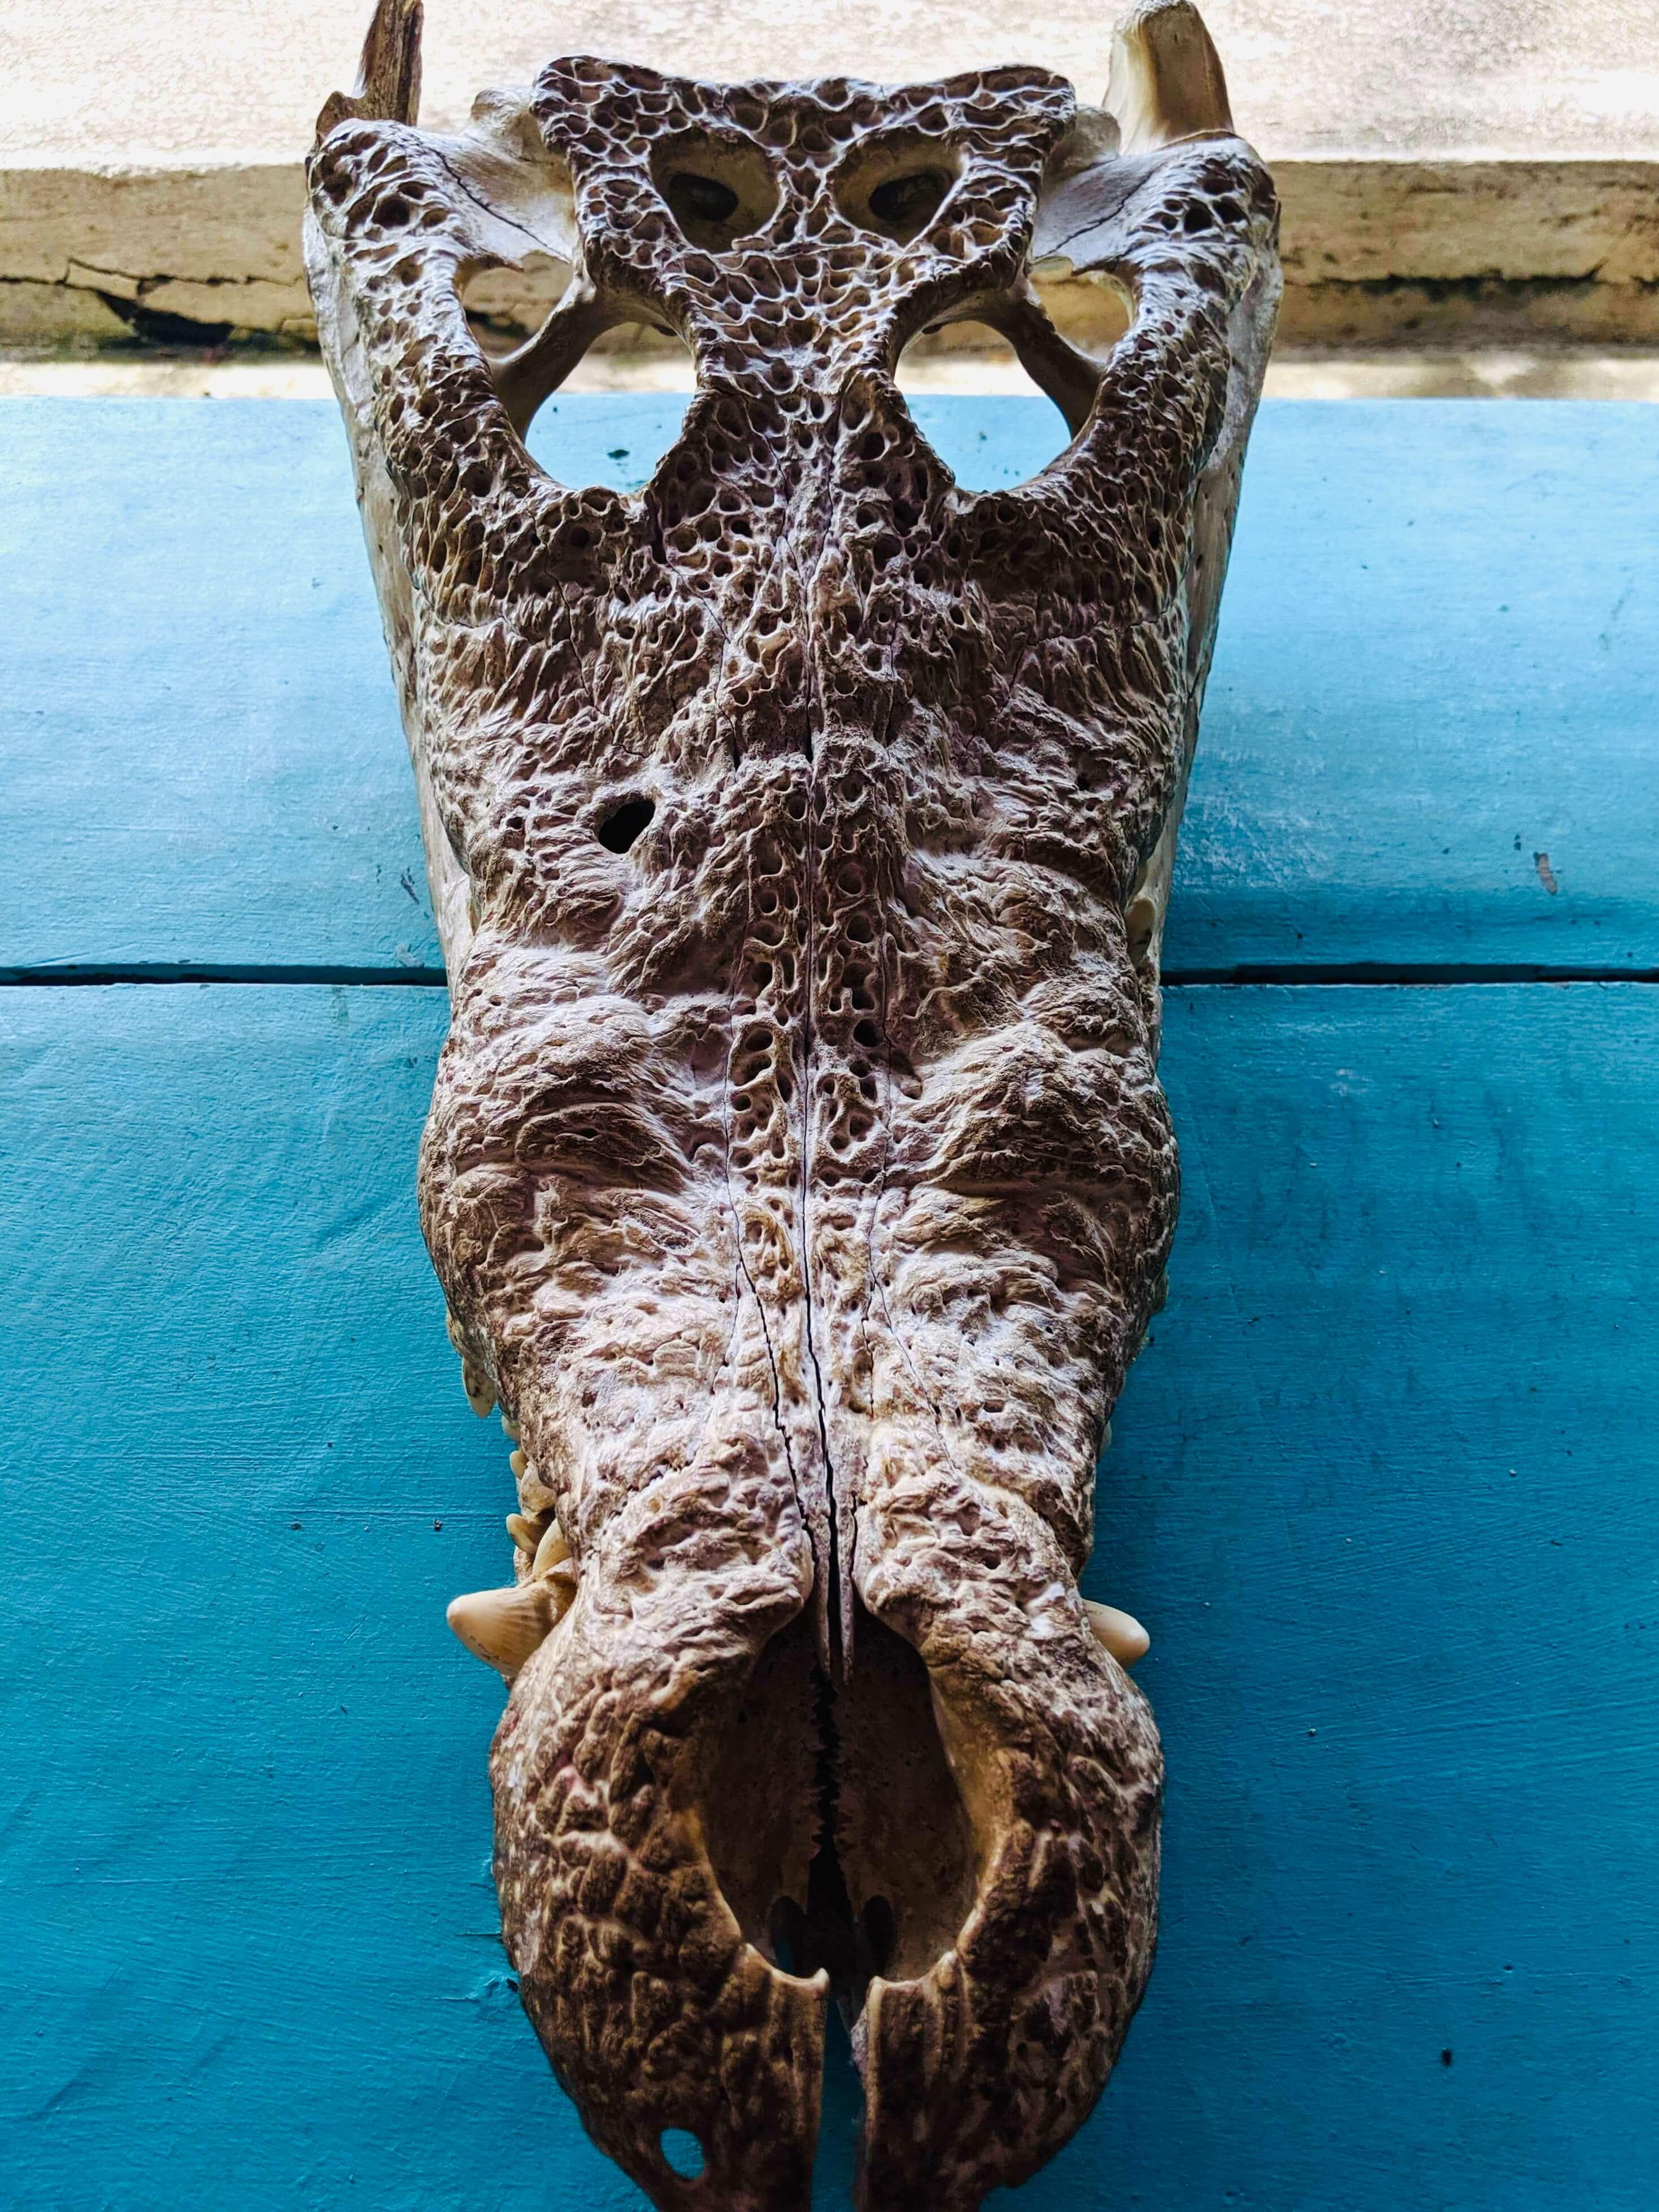 Crocodile skull on a table